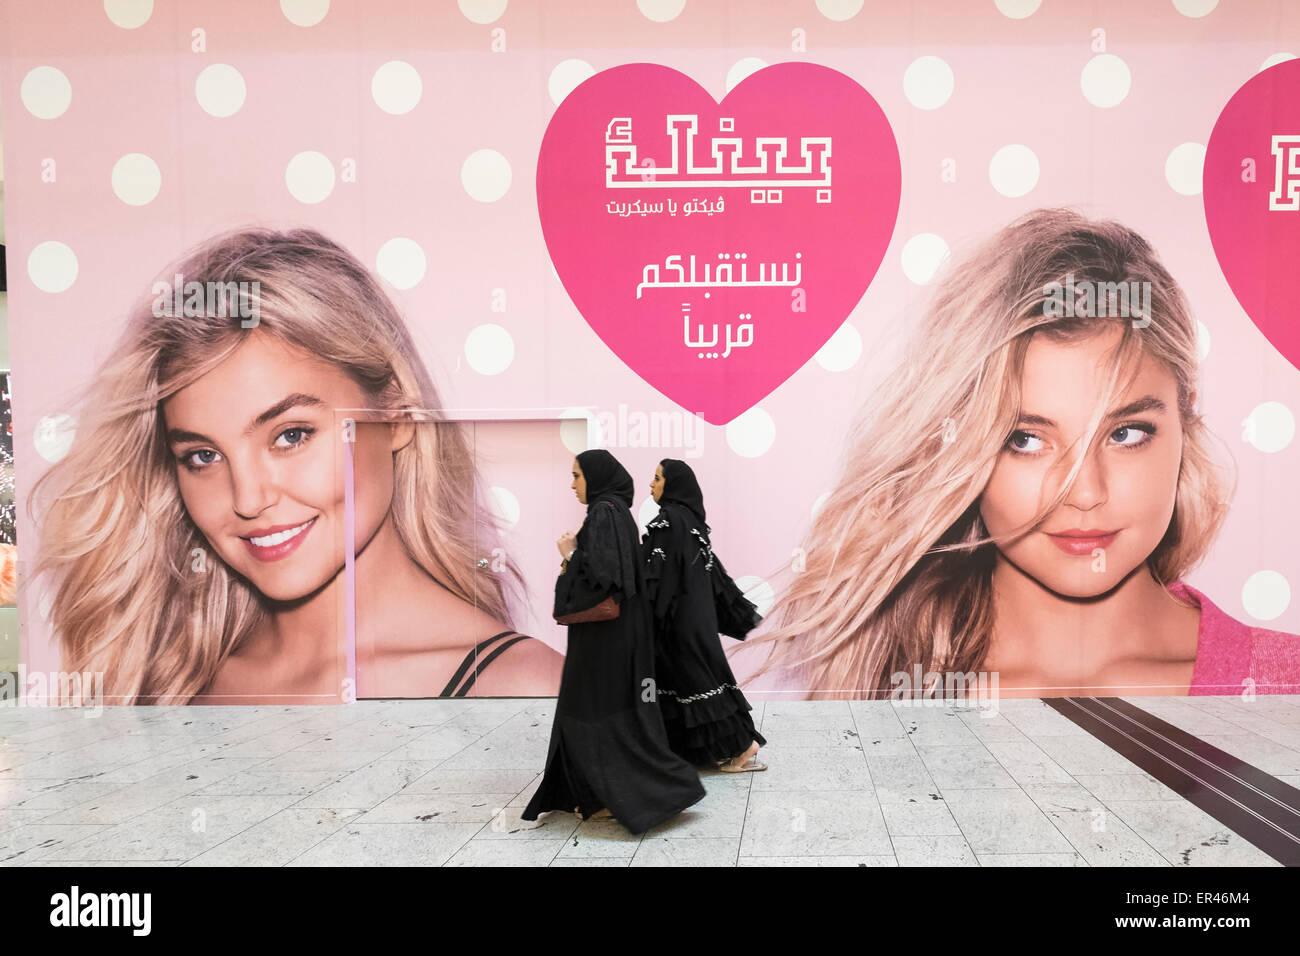 Women walk past billboard for new Victoria's Secret shop in City Centre shopping mall in Manama Kingdom of Bahrain - Stock Image